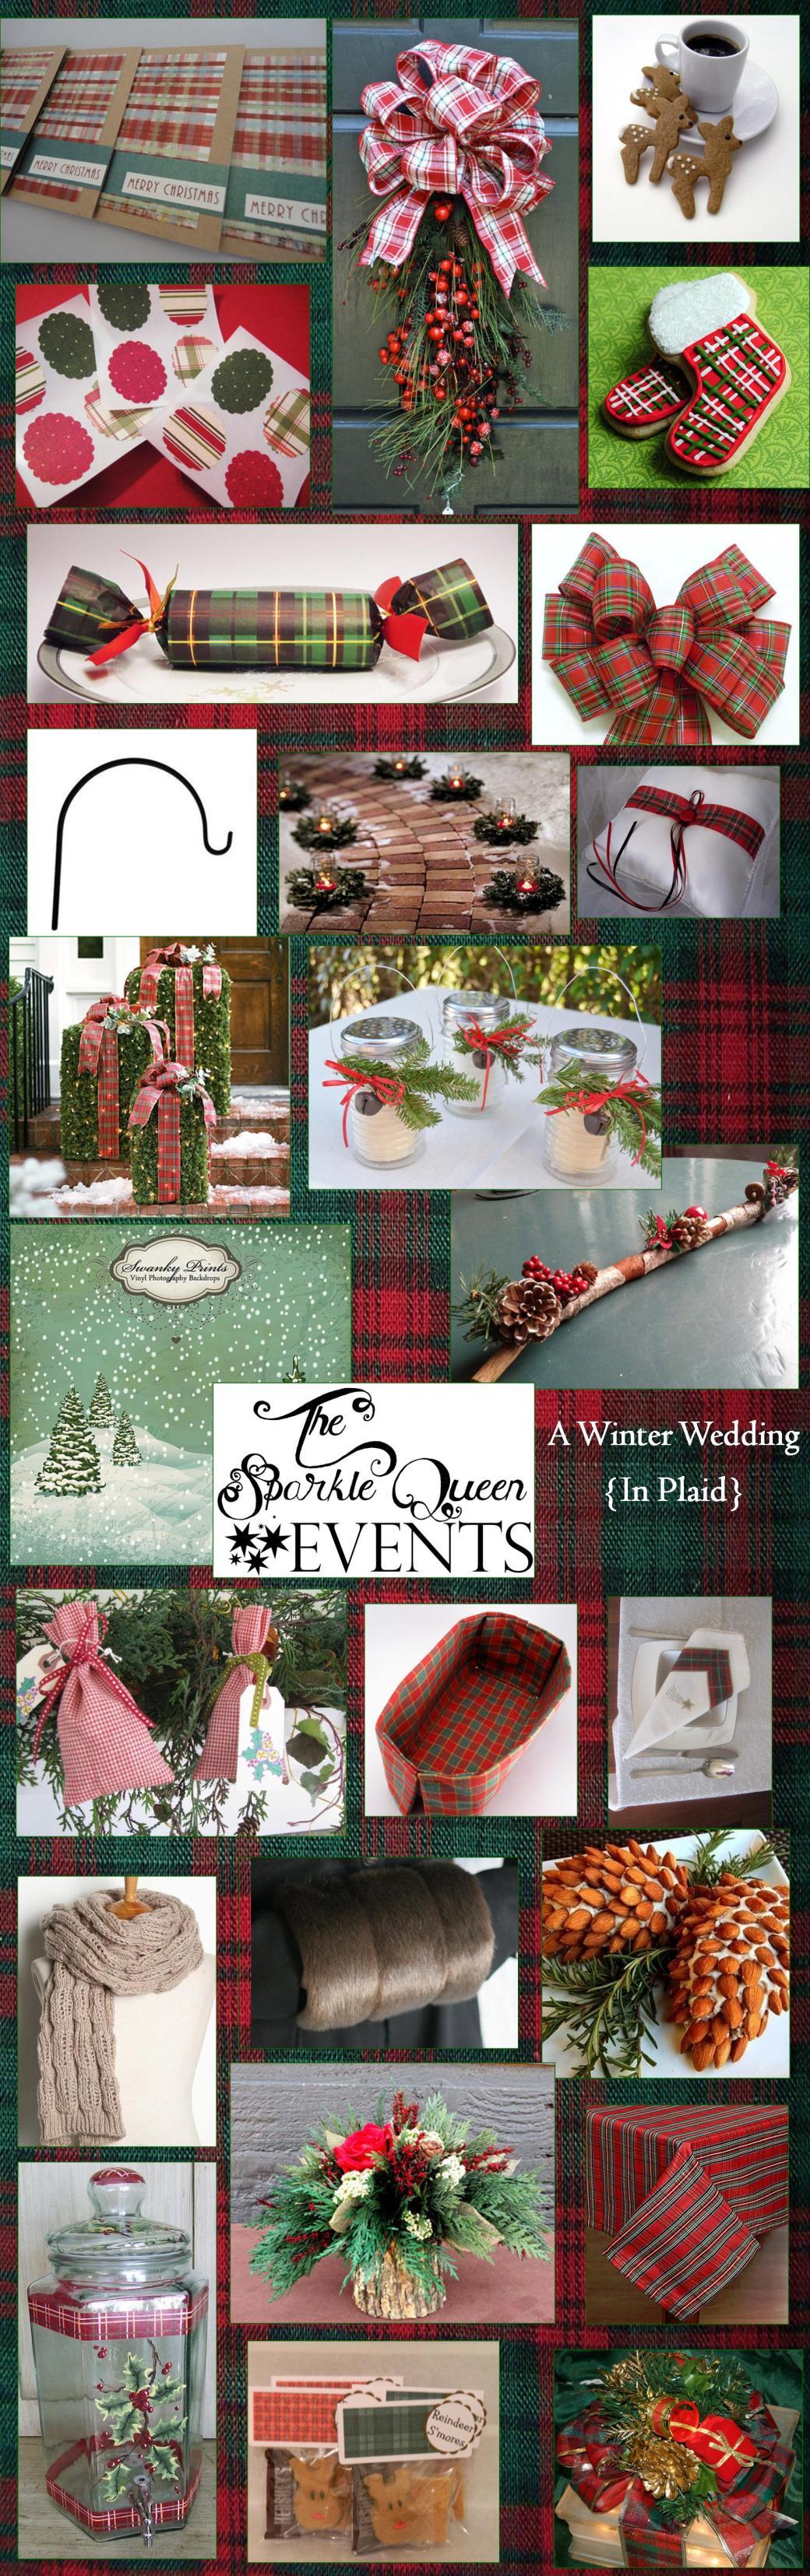 A Christmas Wedding {In Plaid}